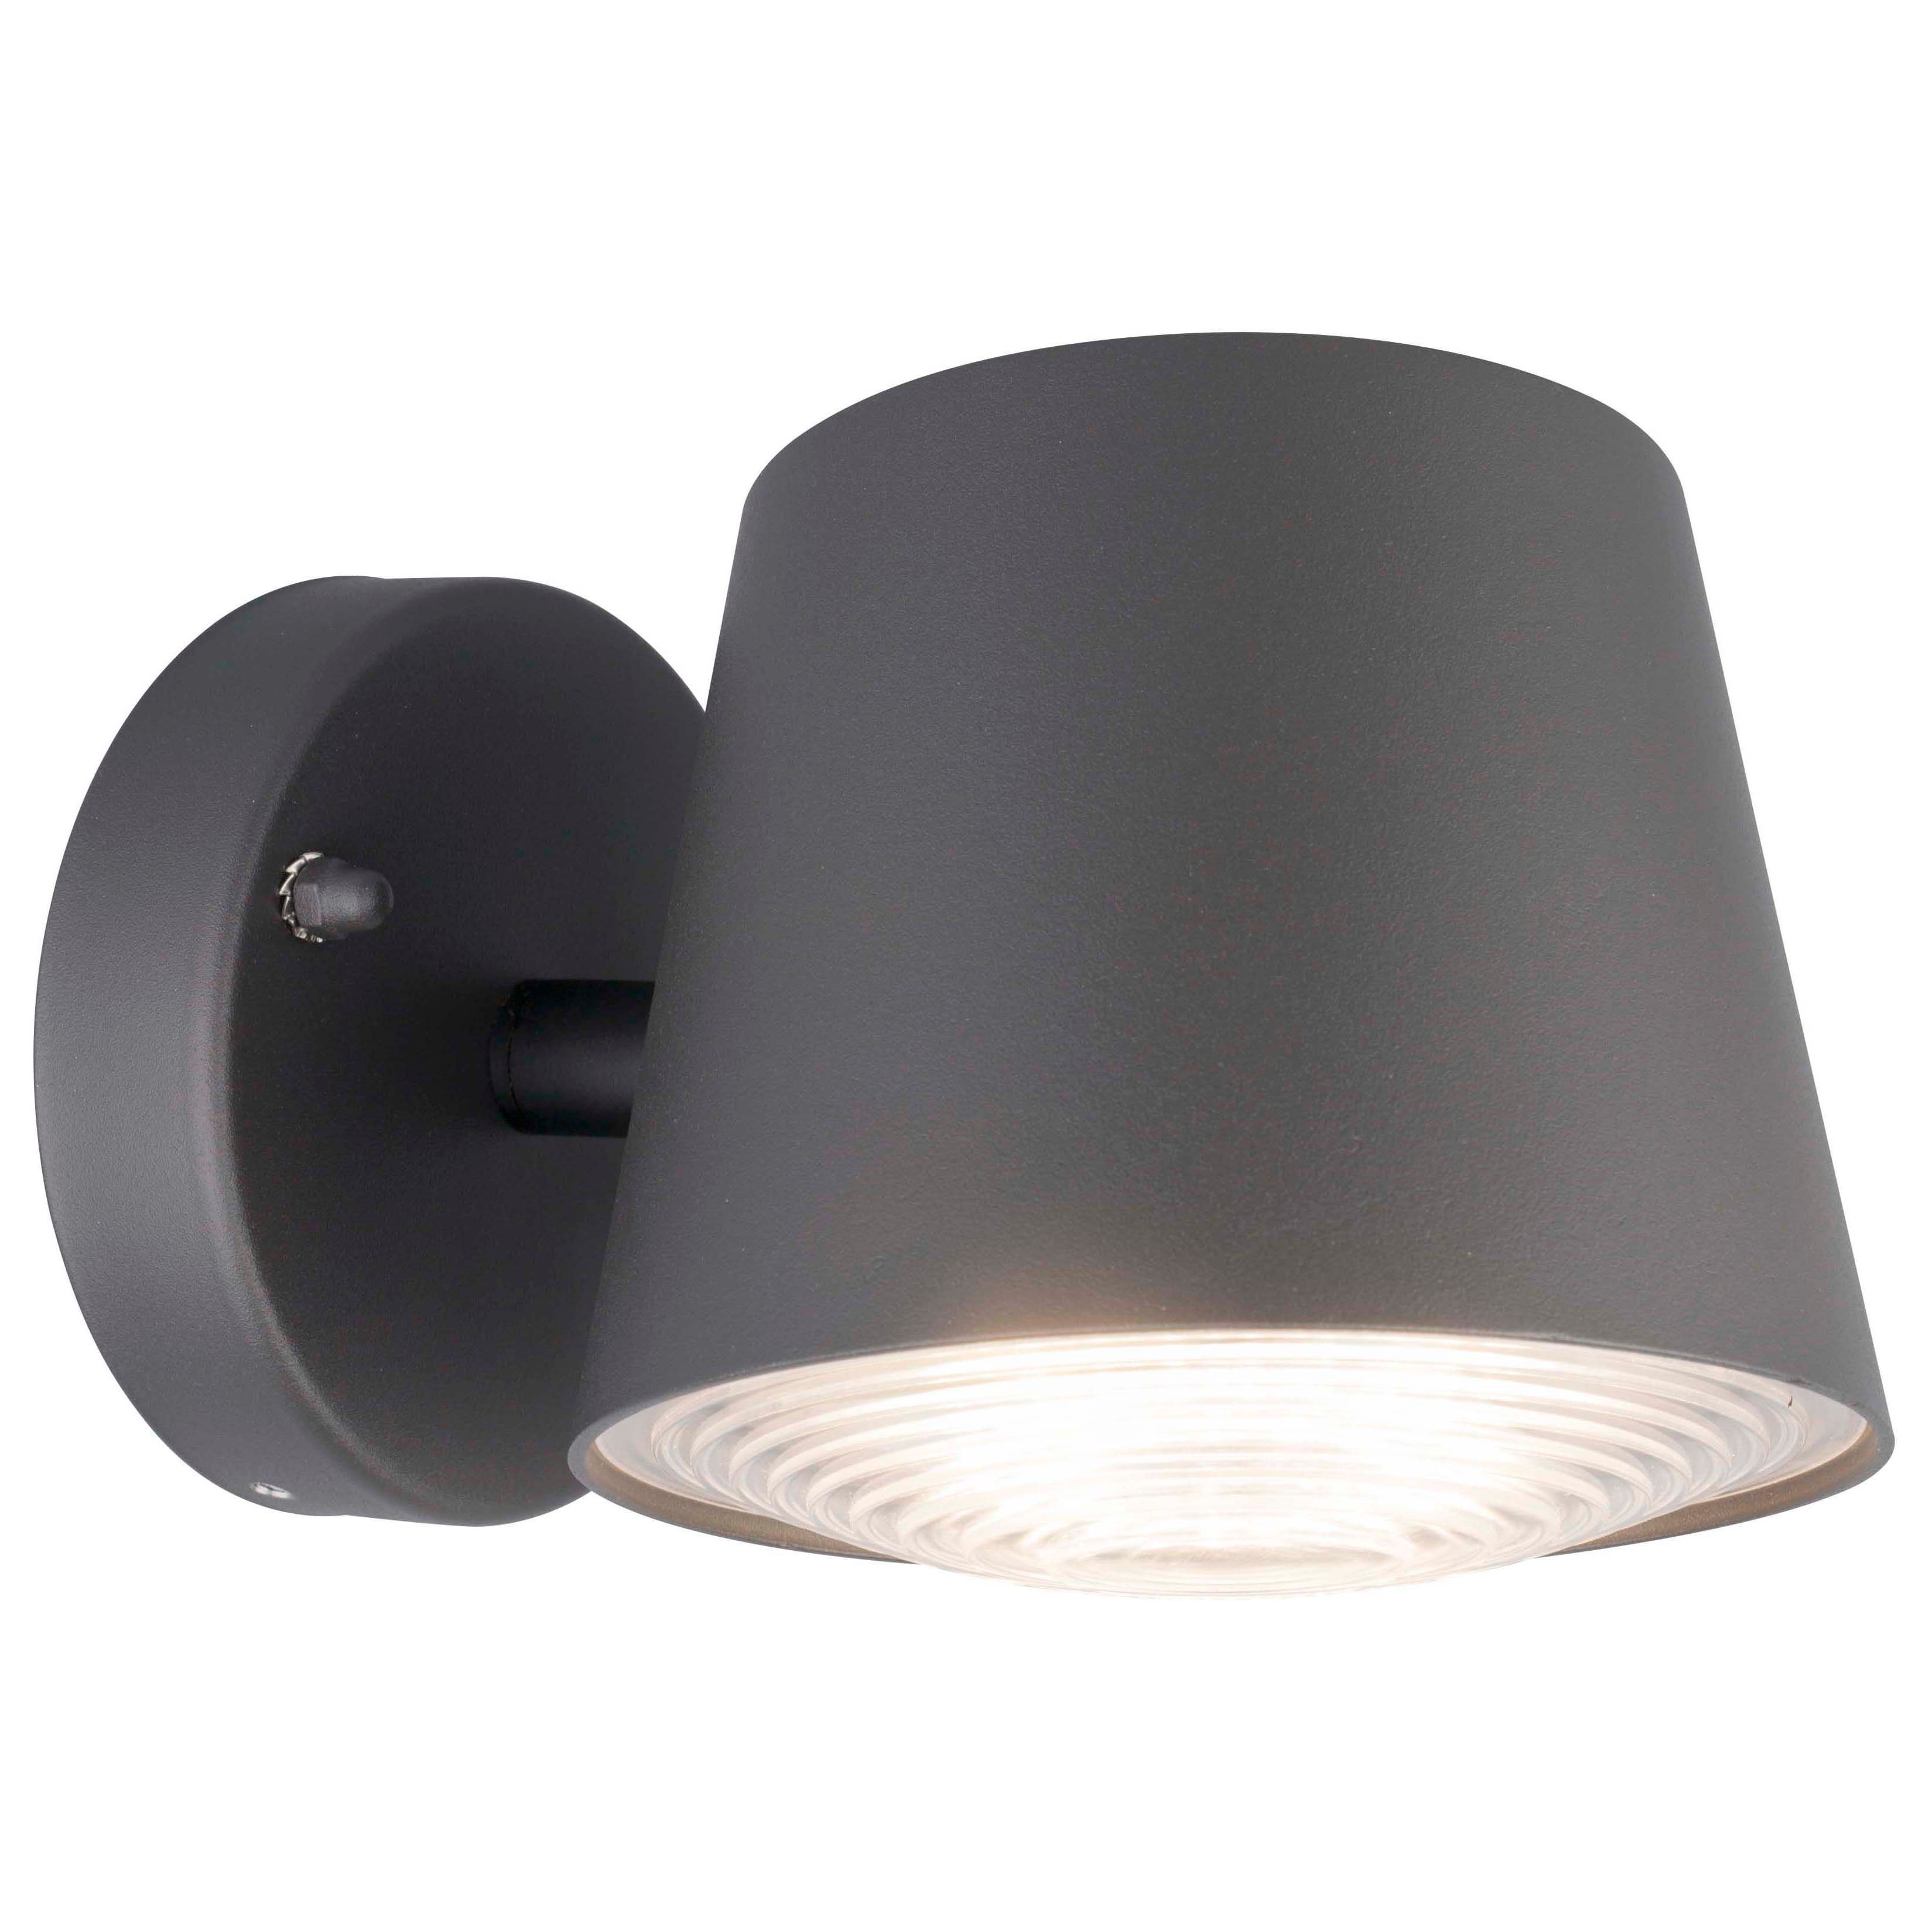 Blooma Barba Dark Grey Mains Powered External Wall Light